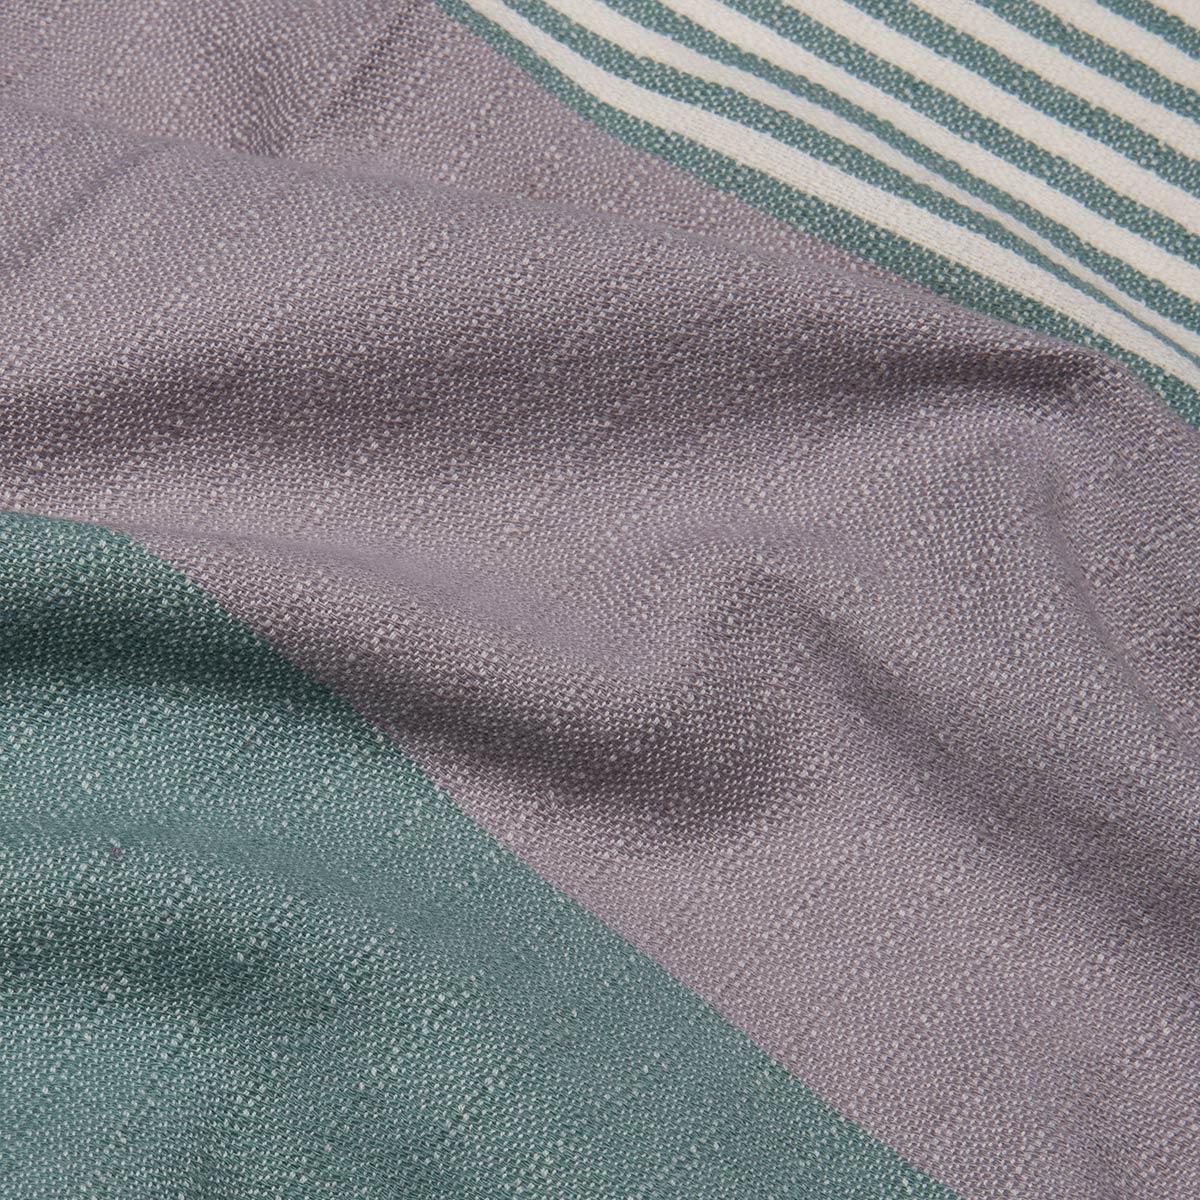 Peshtowel Twin Sultan - Almond Green / Light Grey